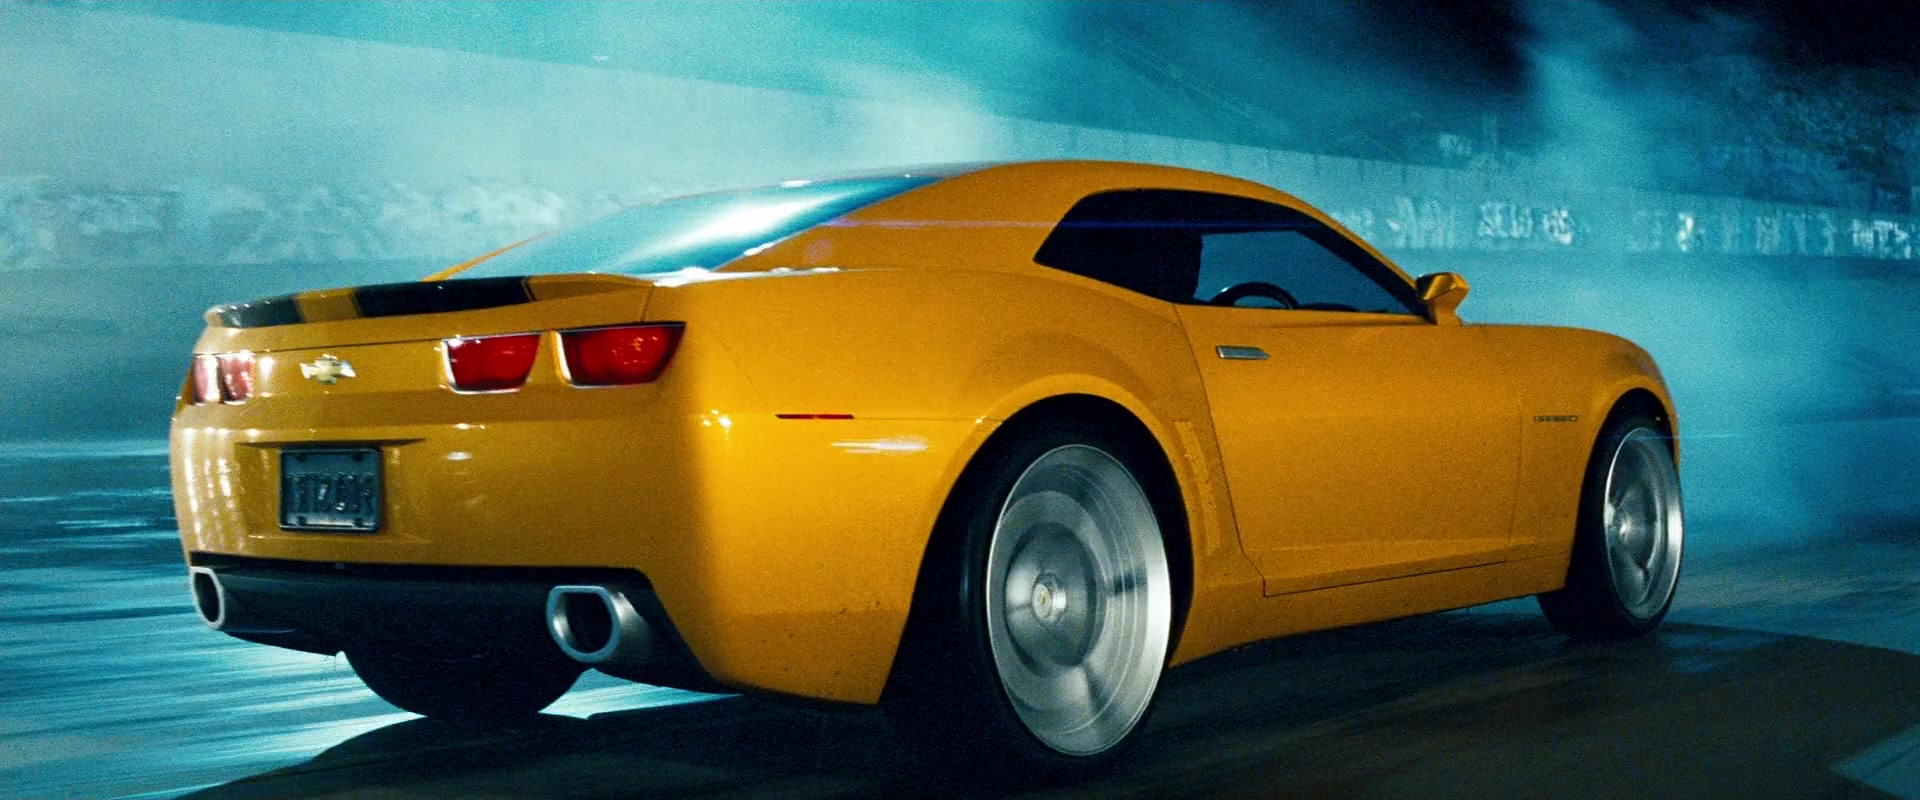 Chevrolet Camaro Yellow Car In Transformers 2007 Movie